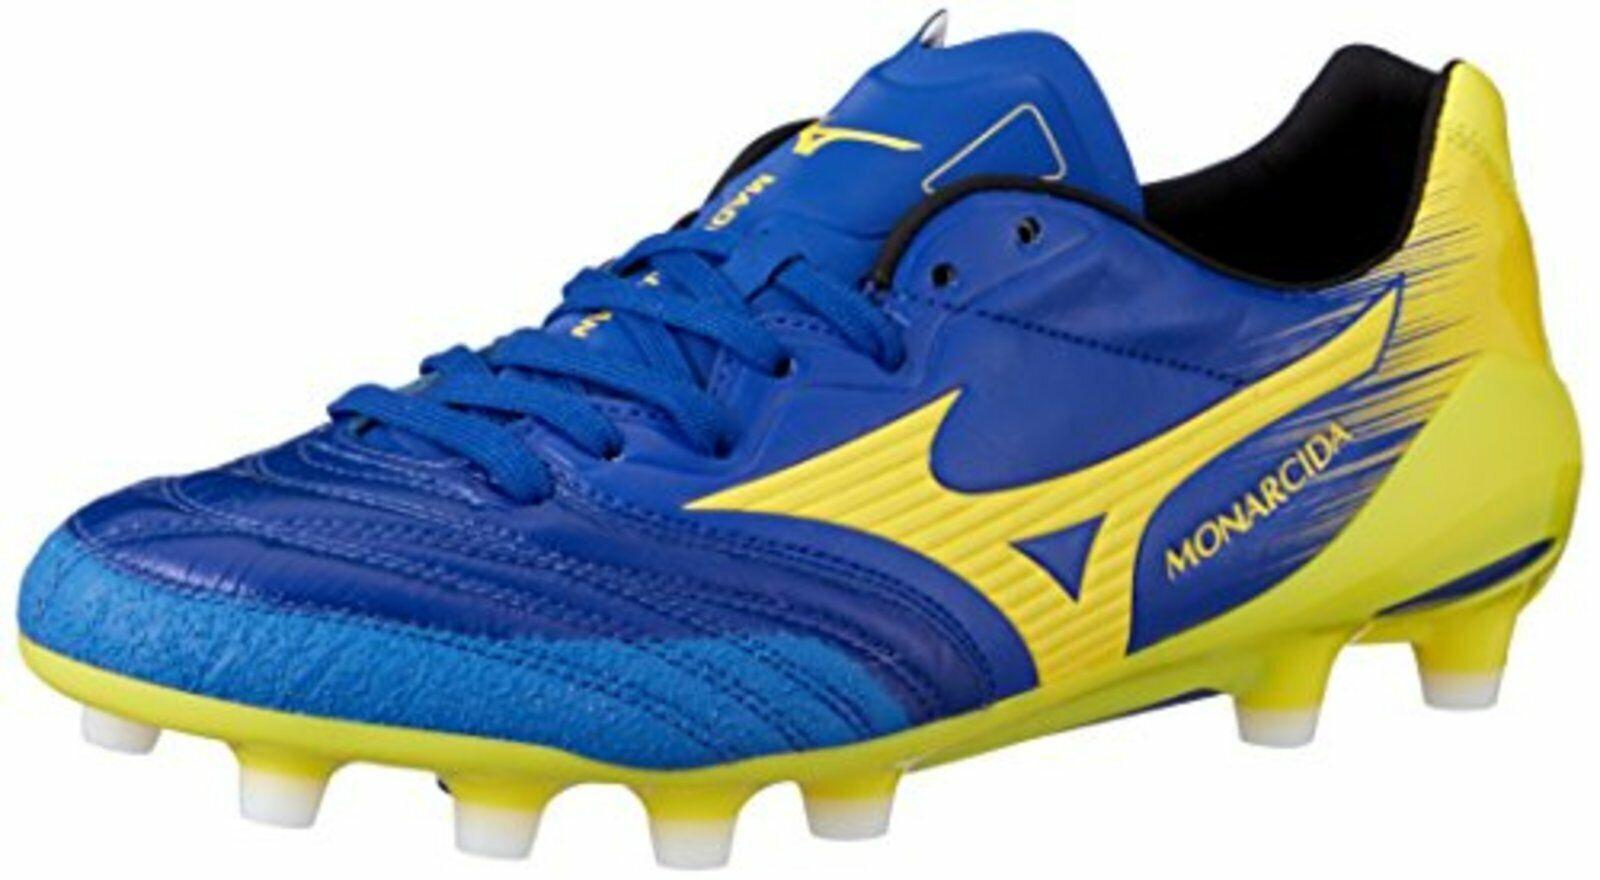 Mizuno Fußball Stollen Schuhe Monarcida 2 Neo Japan P1ga1820 Marineblau Us9.5 (